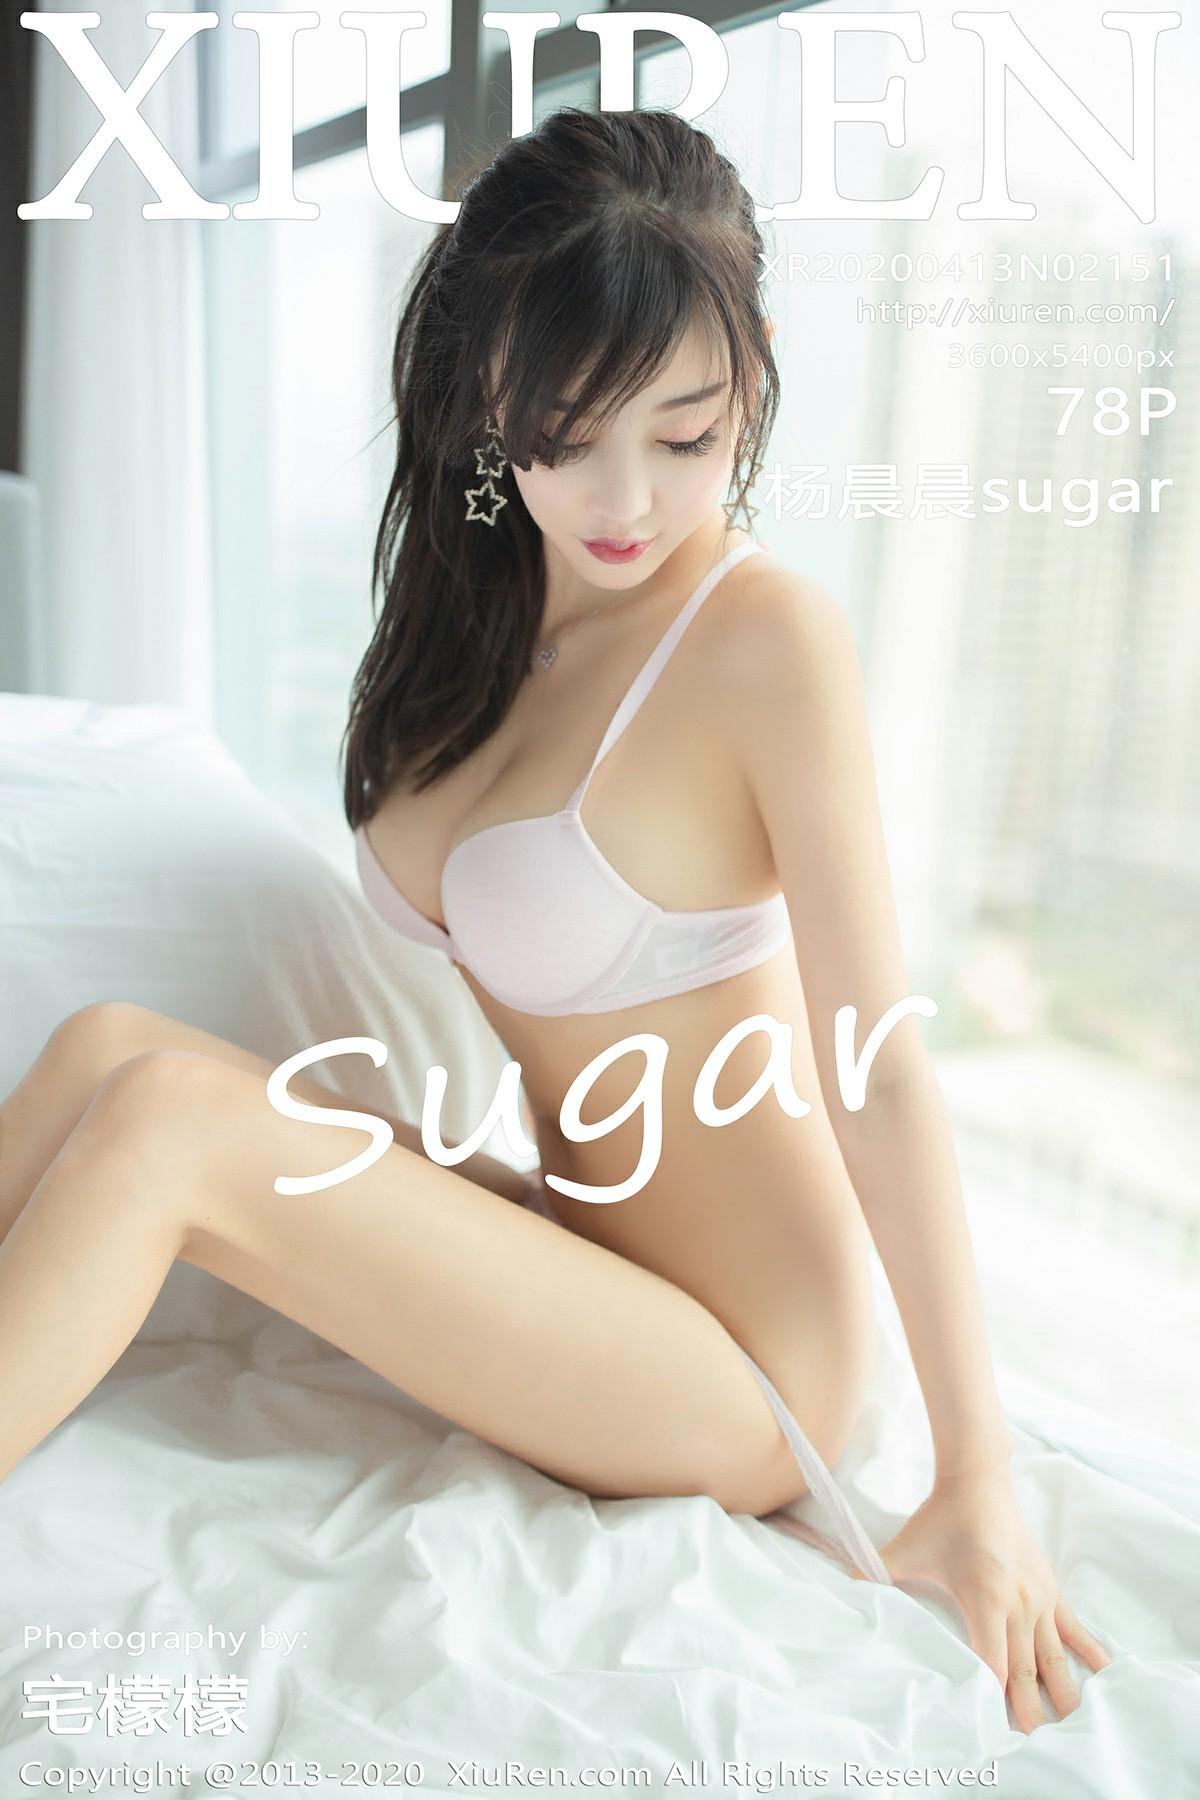 [XiuRen秀人网]2020.04.13 No.2151 杨晨晨sugar[79P] 秀人网 第1张